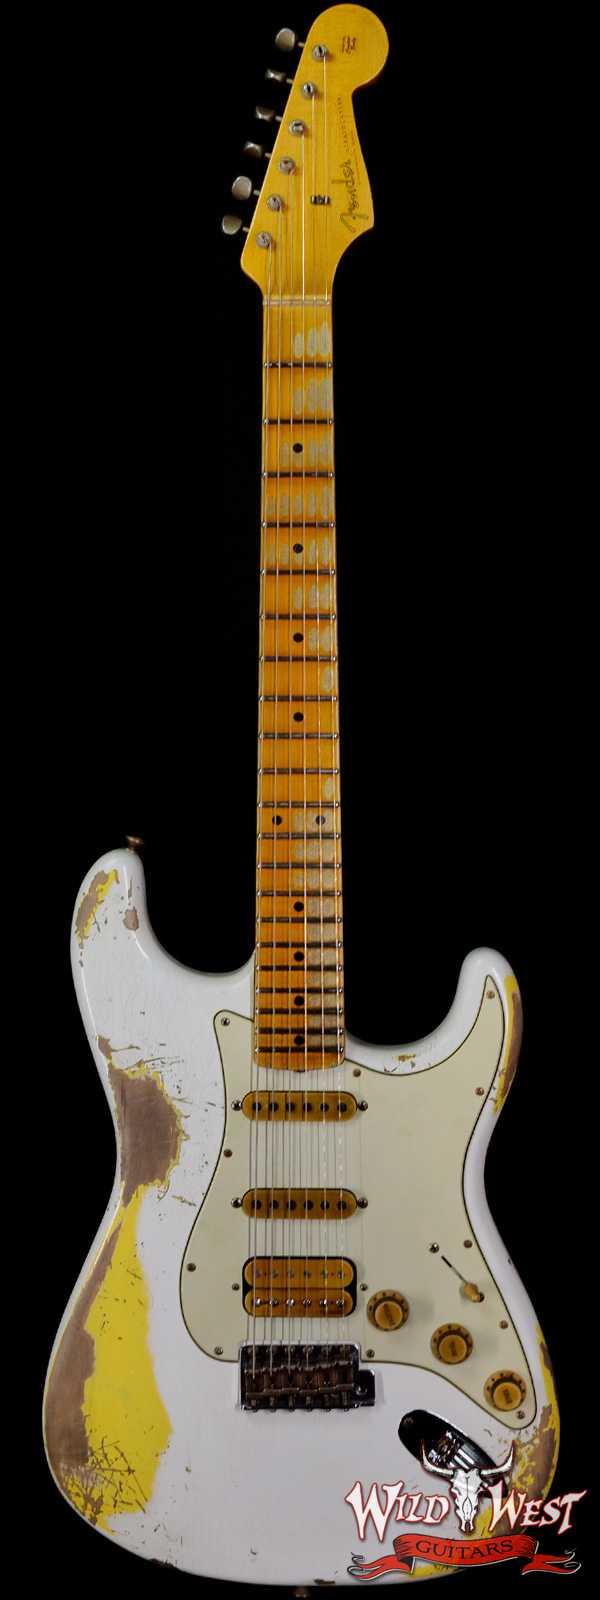 Fender Custom Shop Wild West White Lightning 2.0 Stratocaster HSS Rosewood Board 21 Frets Heavy Relic Graffiti Yellow